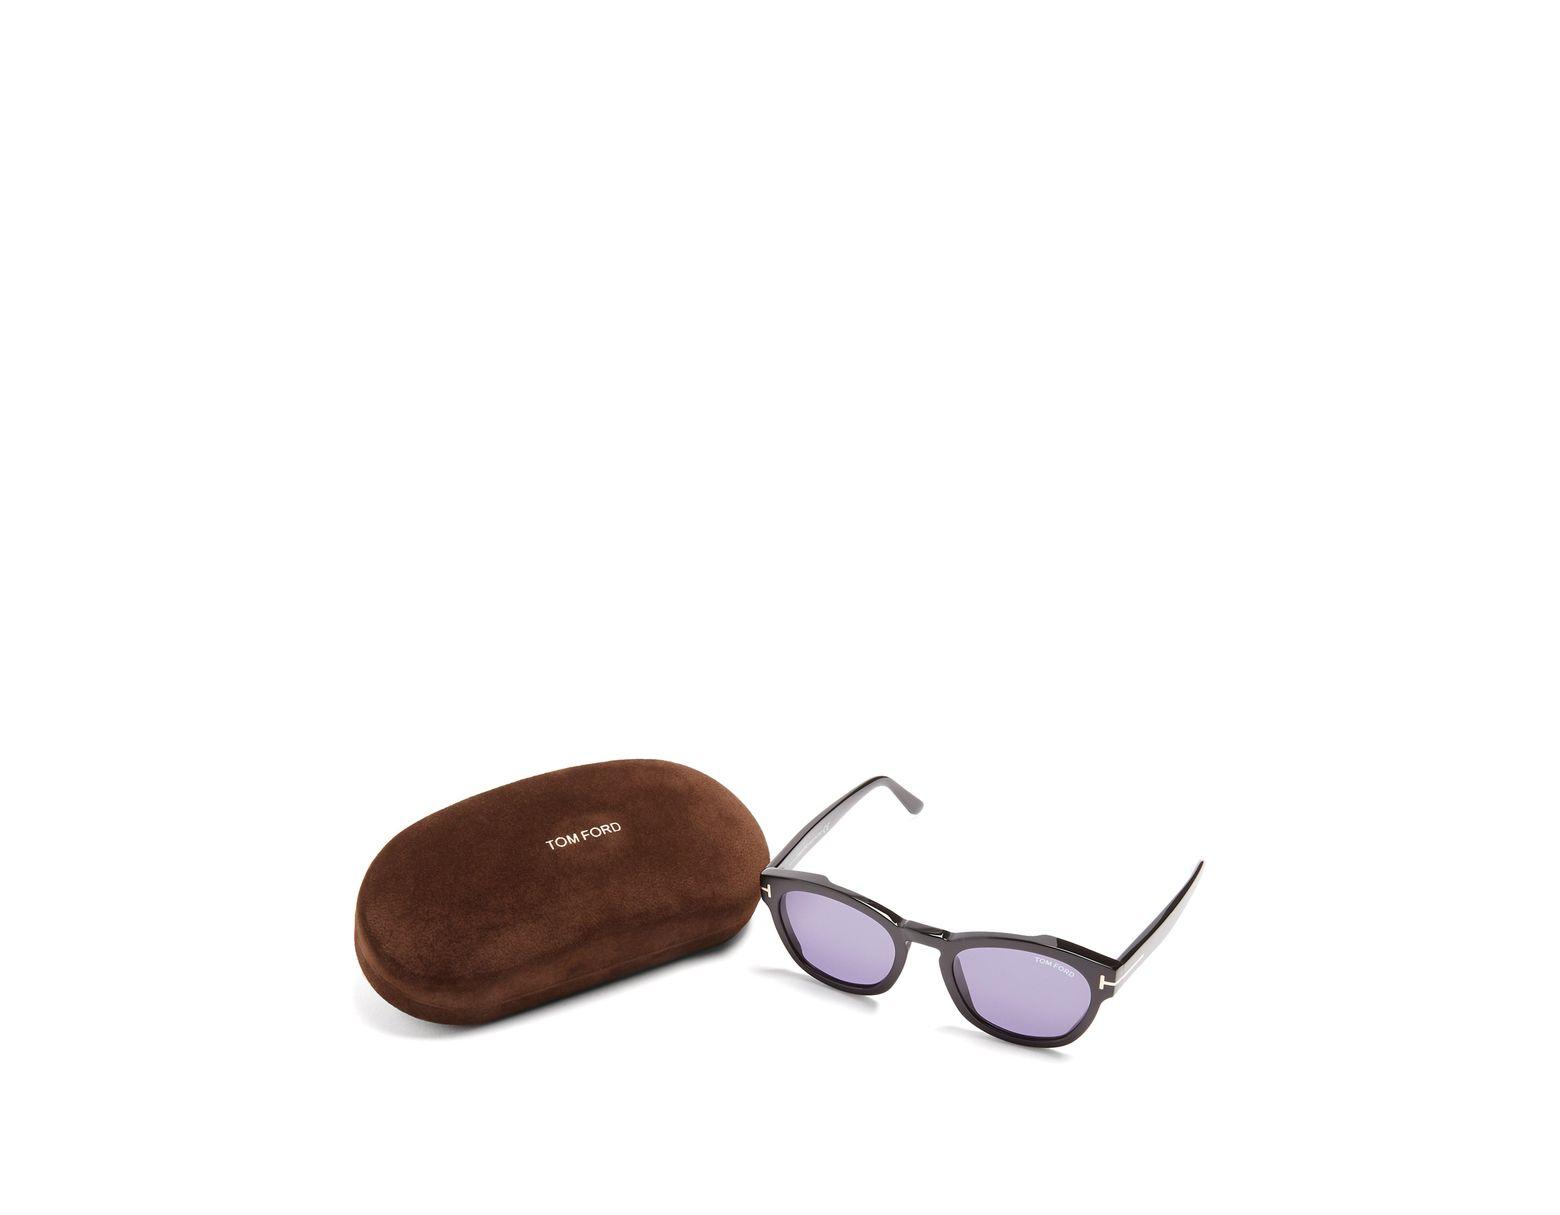 a9b63f51fa Tom Ford Bryan Square Frame Sunglasses in Black for Men - Lyst